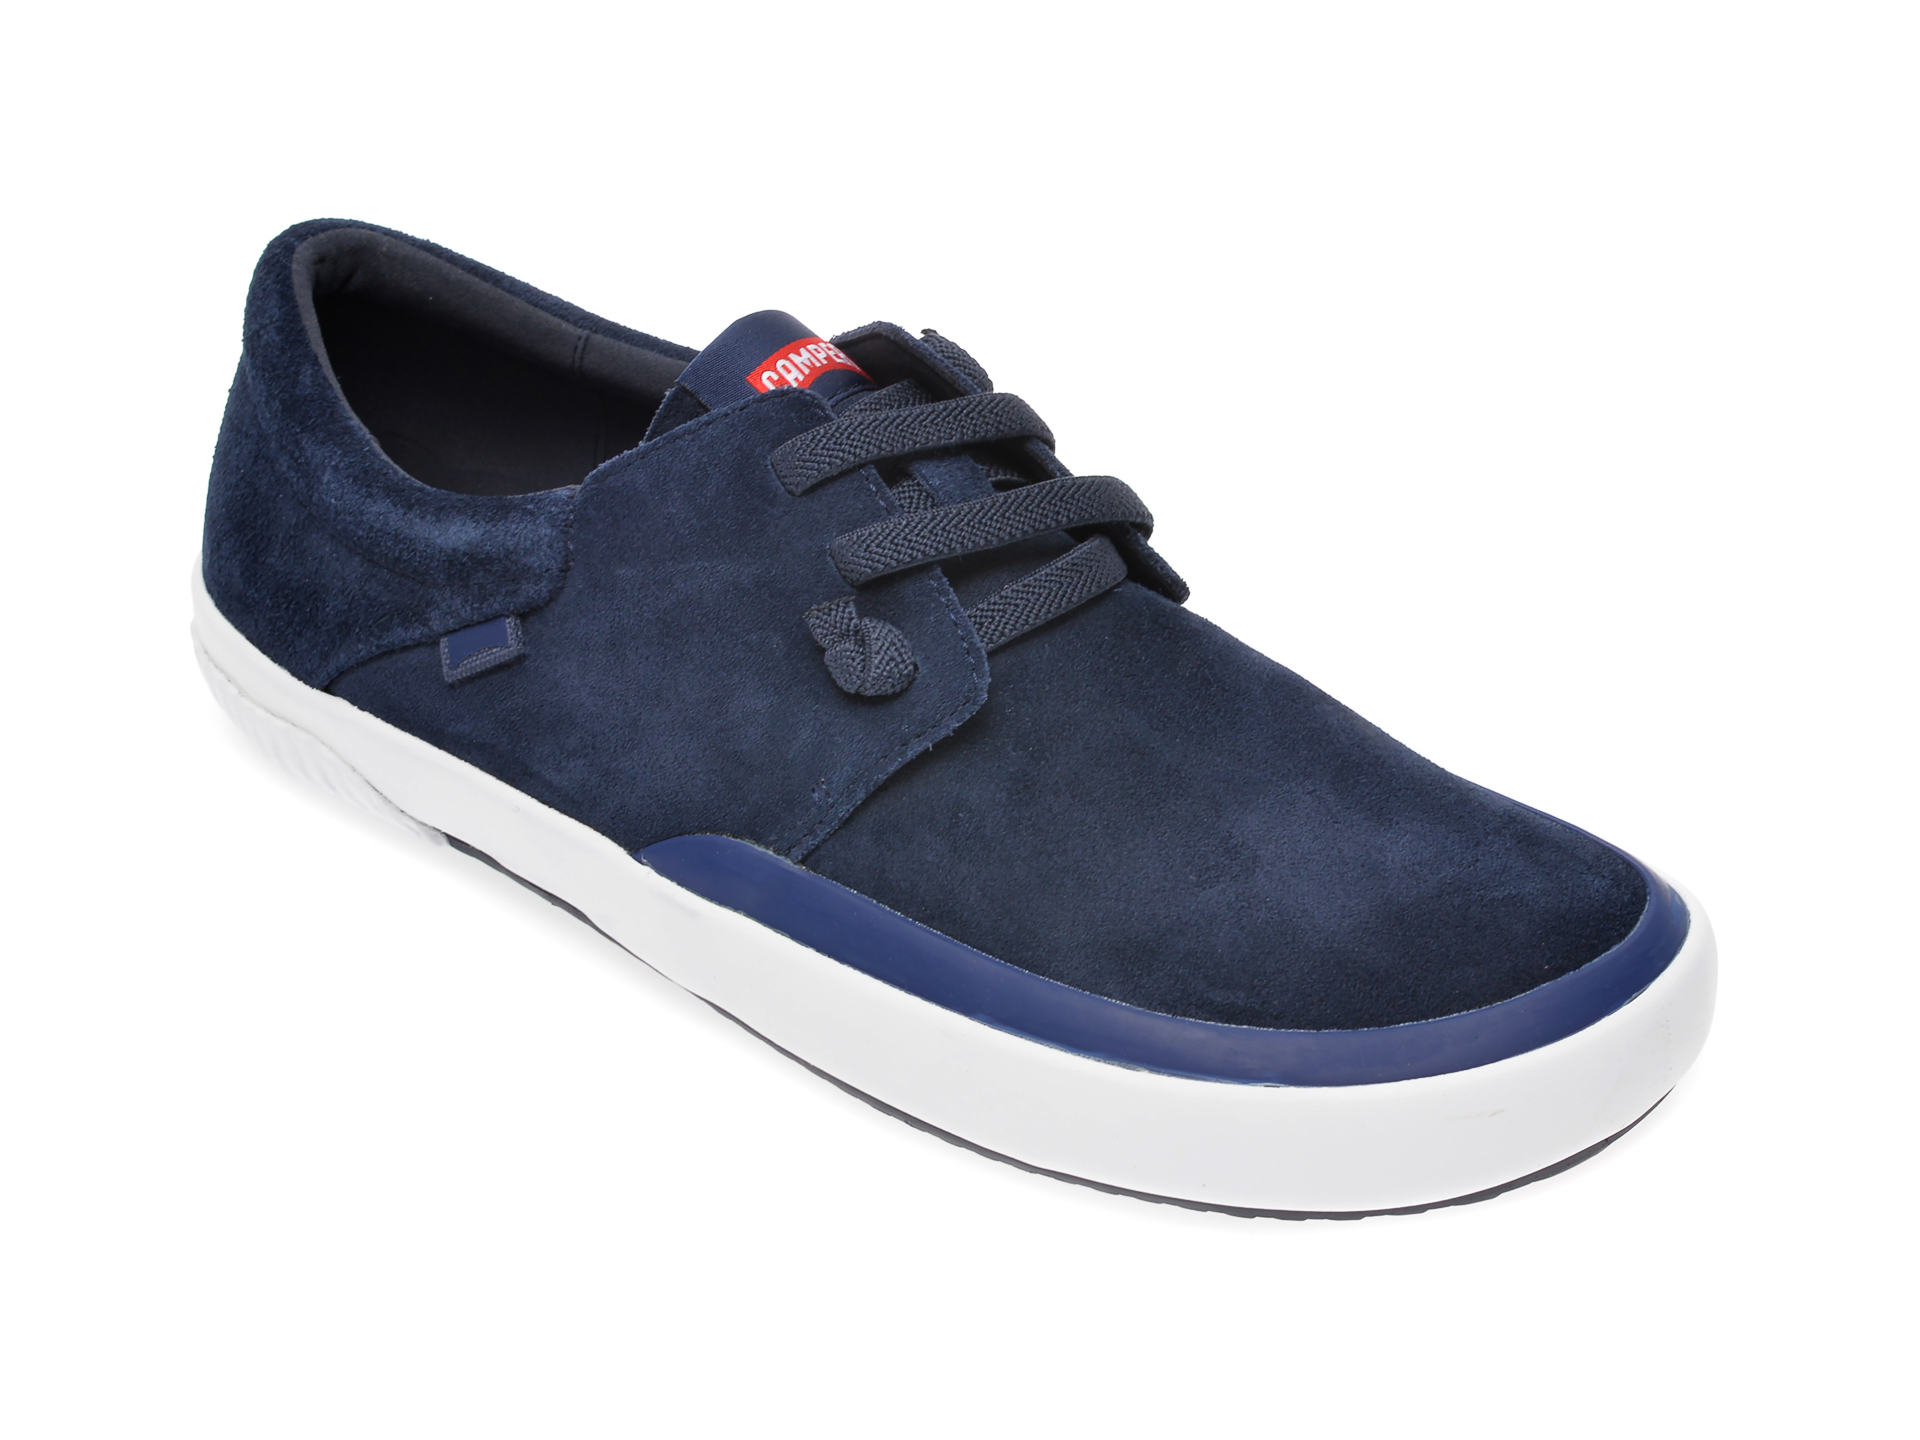 Pantofi CAMPER bleumarin, K100414, din piele intoarsa imagine